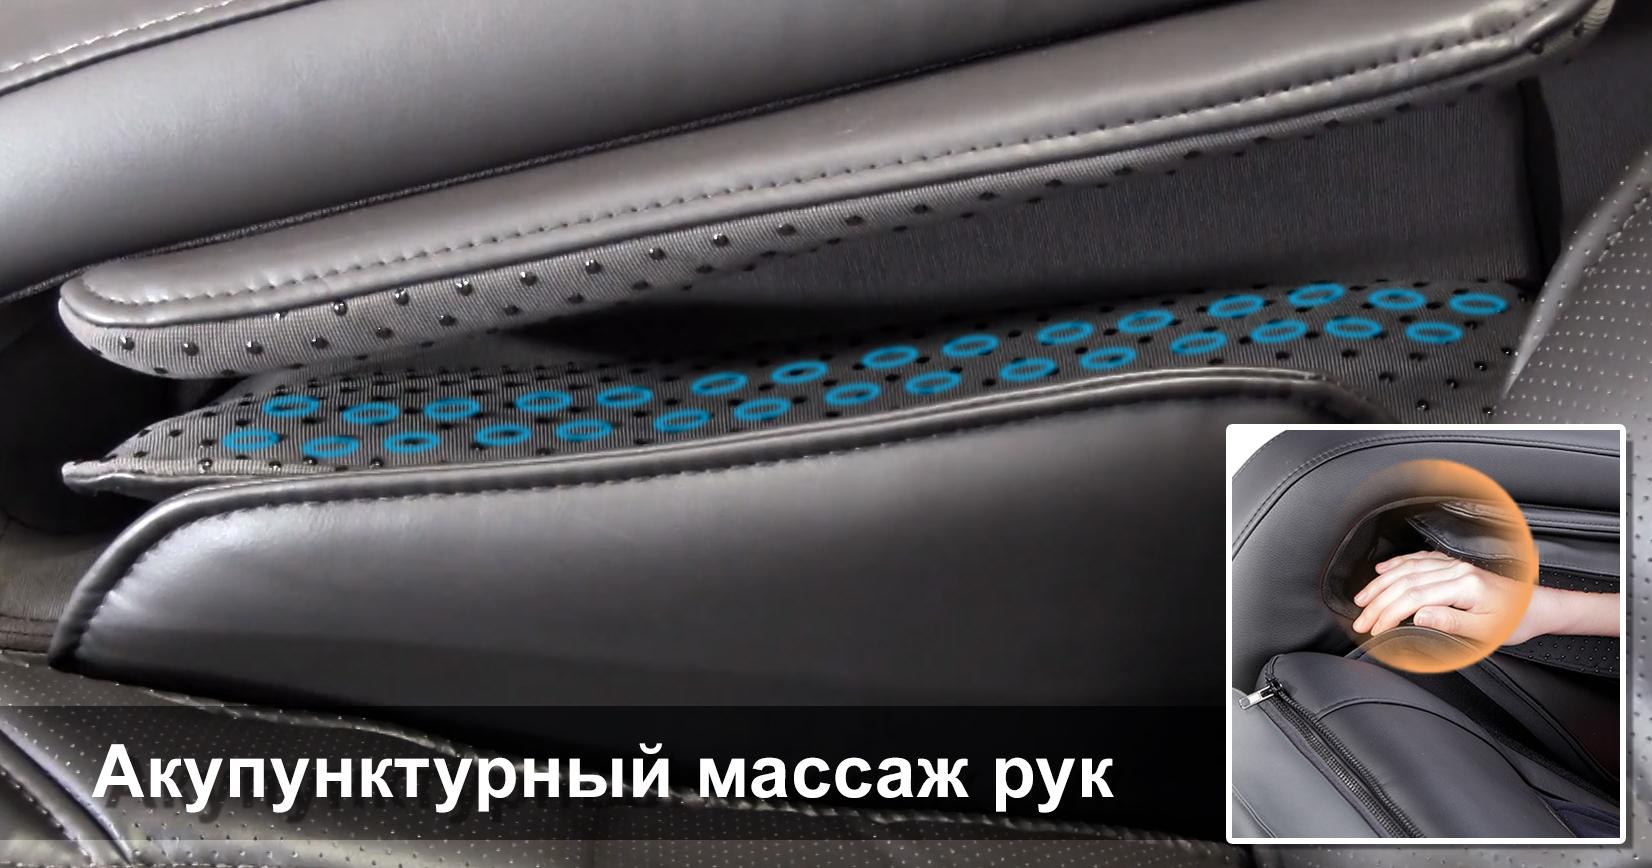 Массажное кресло UNO GRANDE Акупунктурный массаж